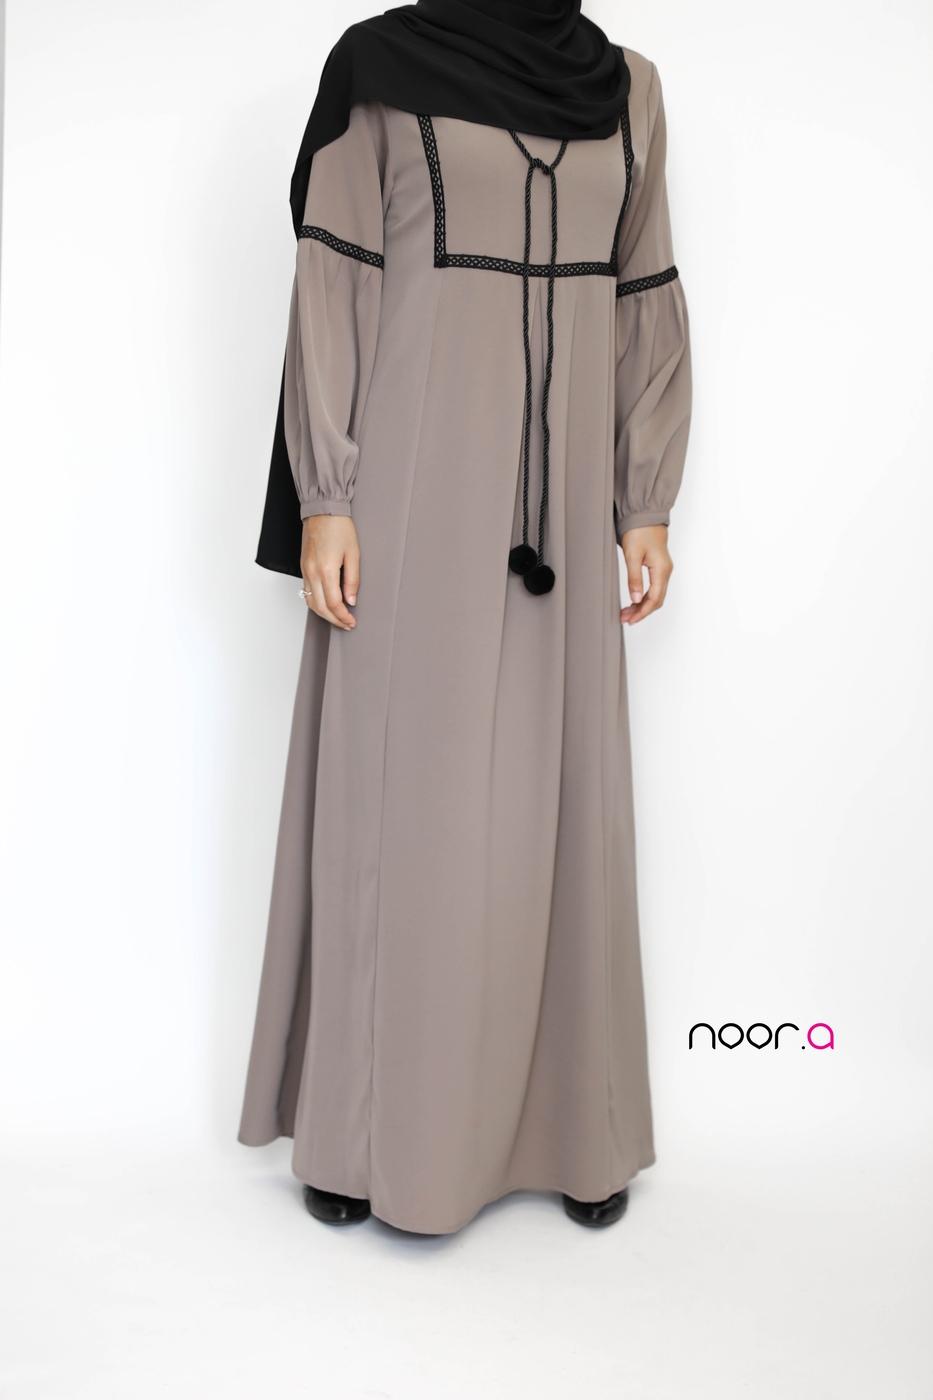 robe-longue-safa-taupe-hijab-soie-de-medine-noir